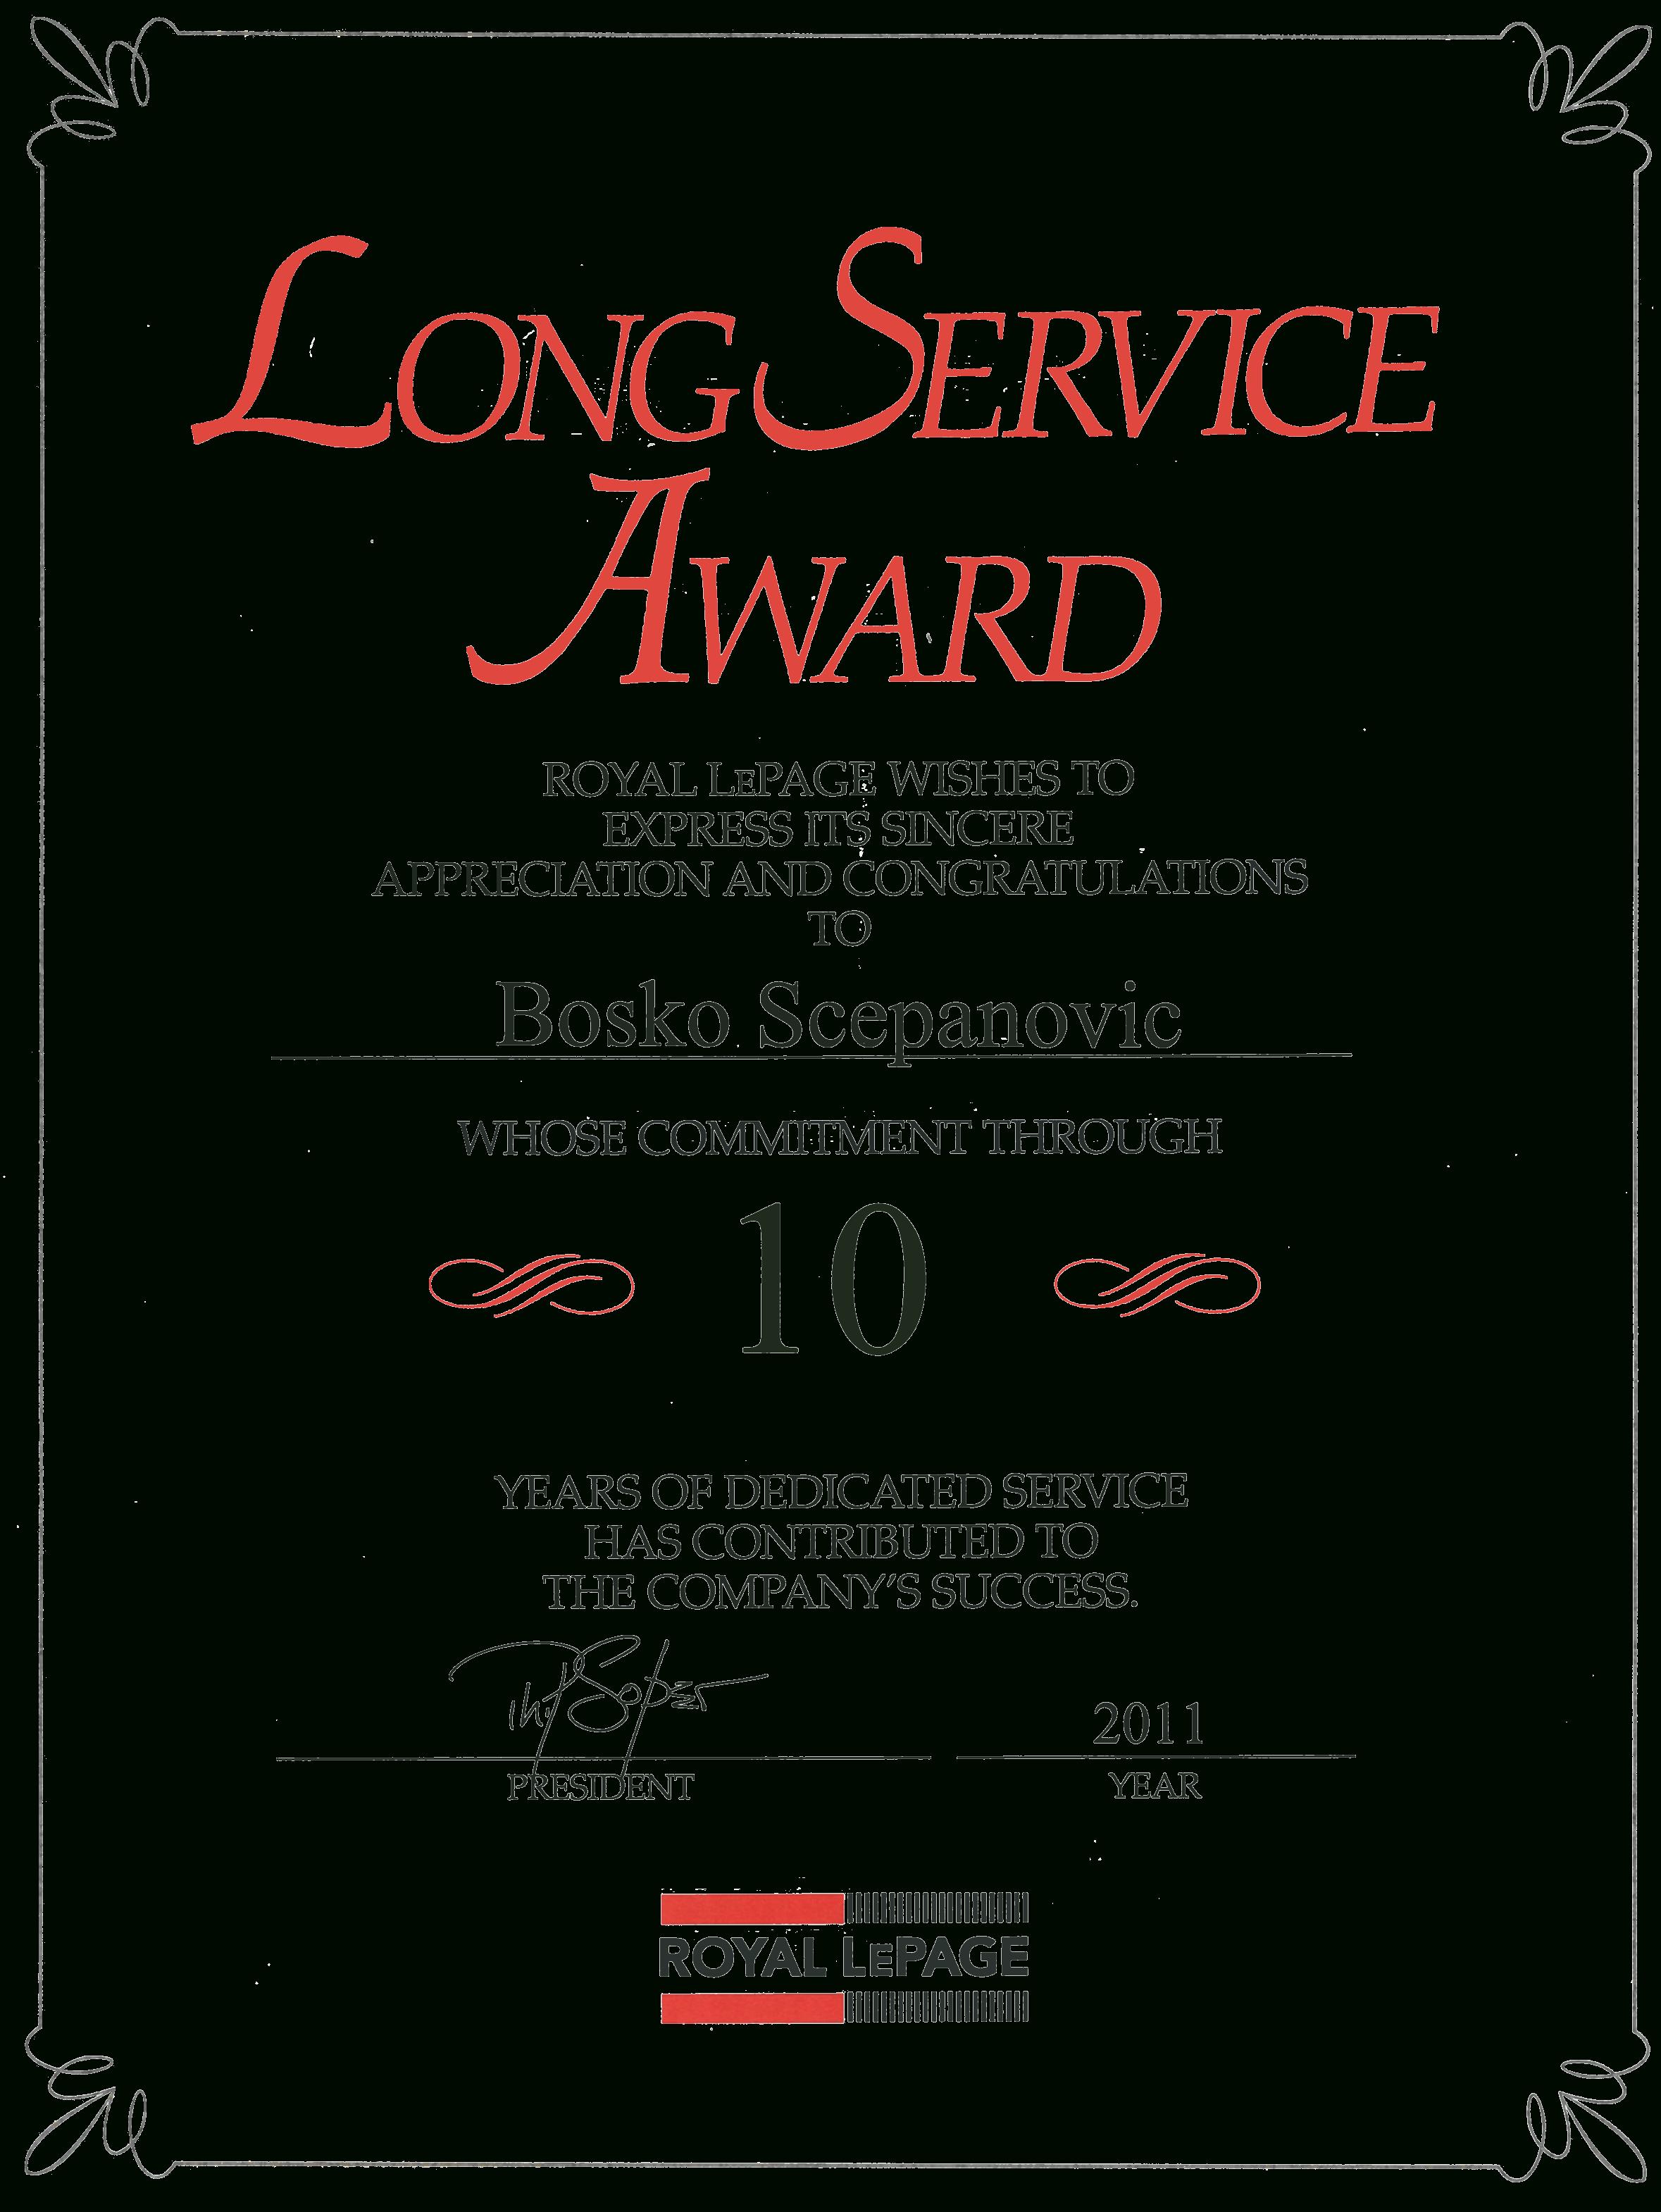 Long Service Award Certificate Template Free Forte Euforic Co Inside Leadership Award Certificate Template